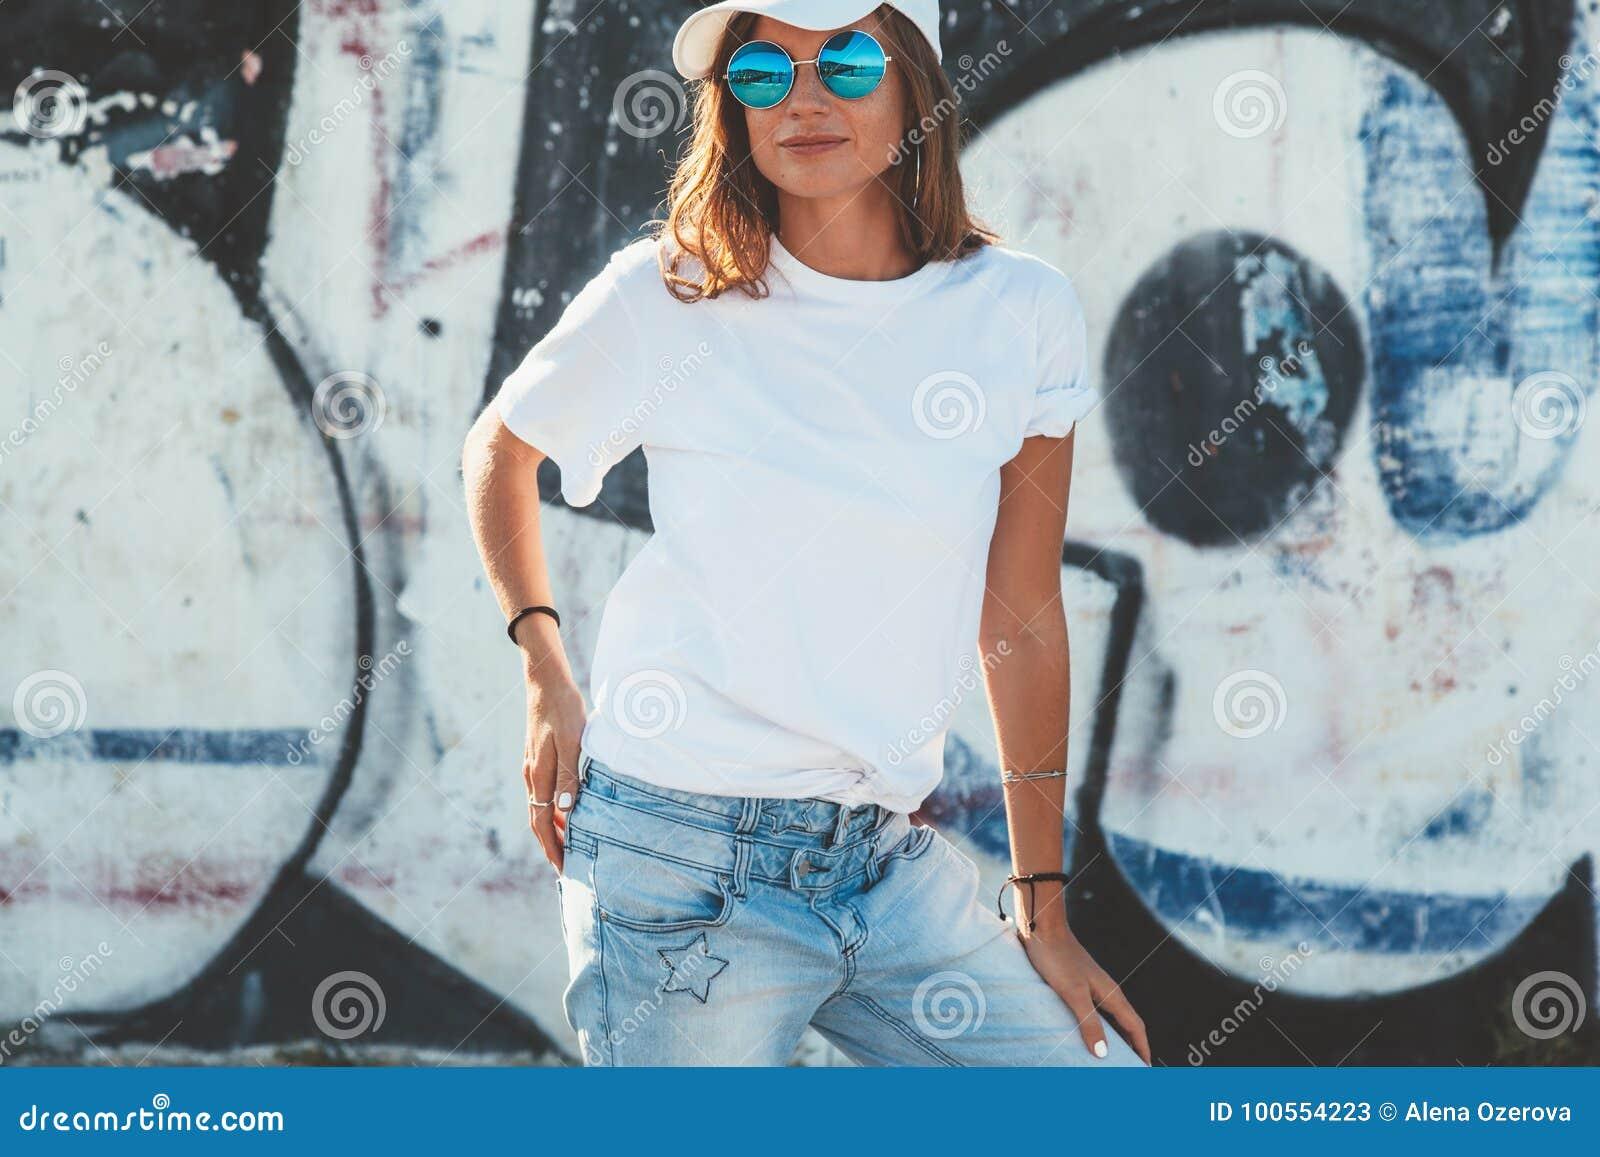 325e49f6a Tshirt modelo e óculos de sol lisos vestindo que levantam sobre a rua wal